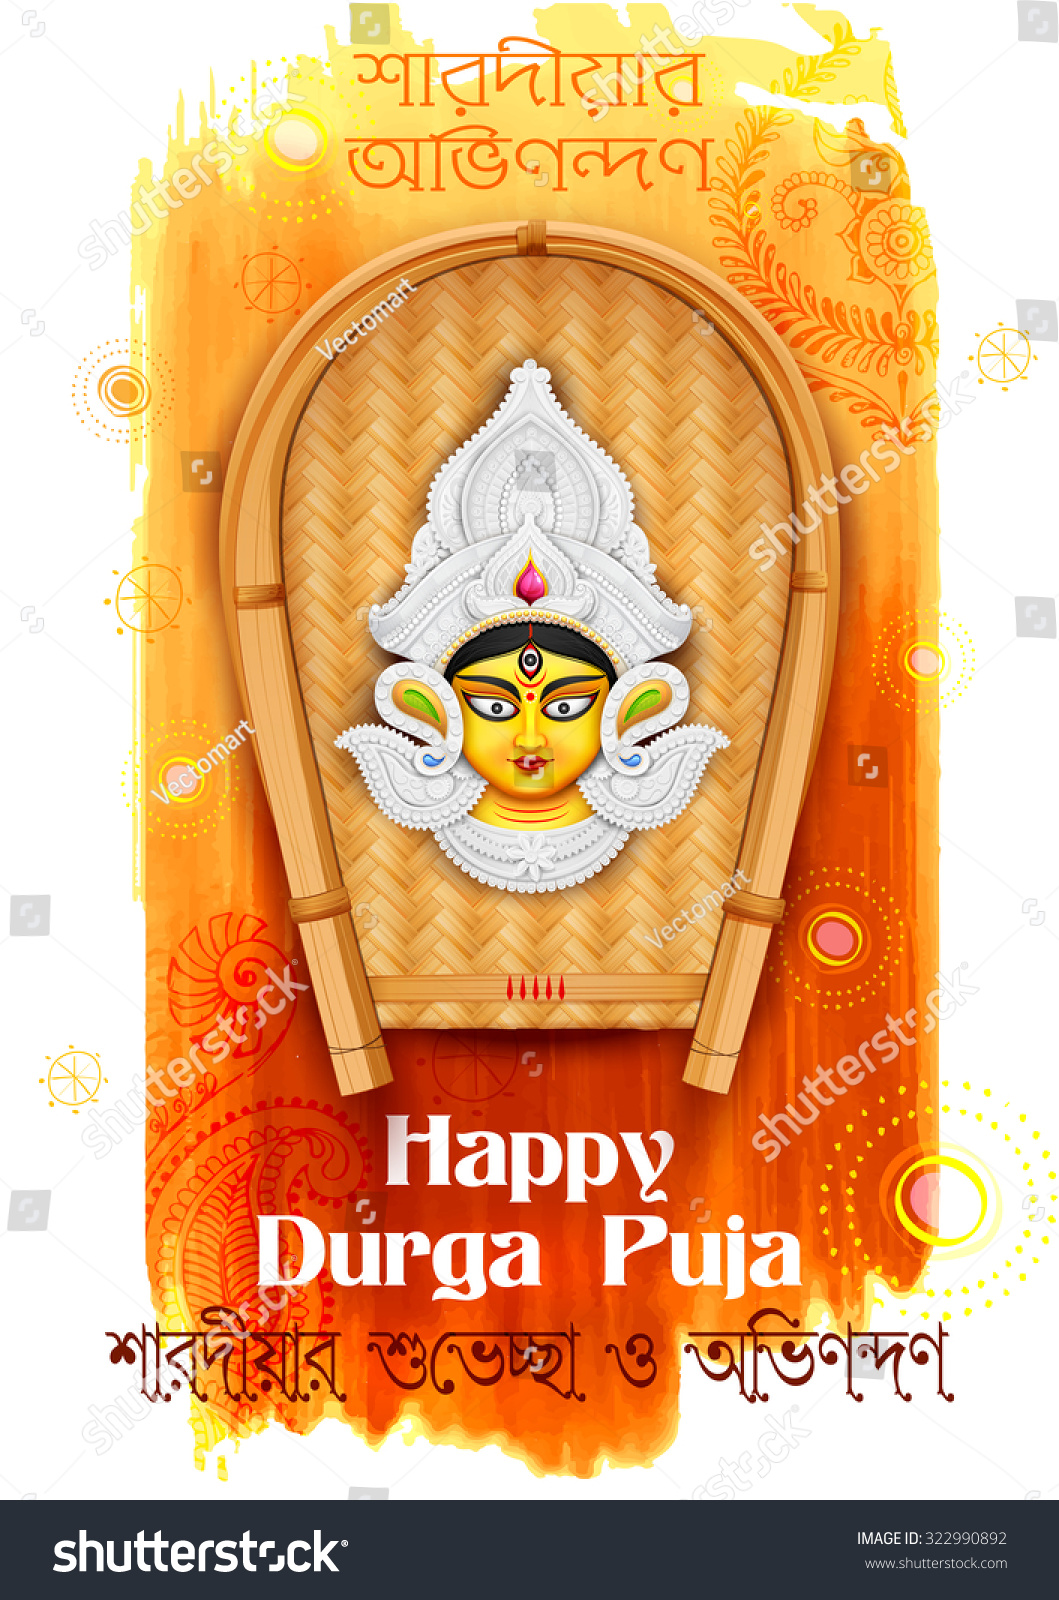 Illustration Happy Durga Puja Background Bengali Stock Vector